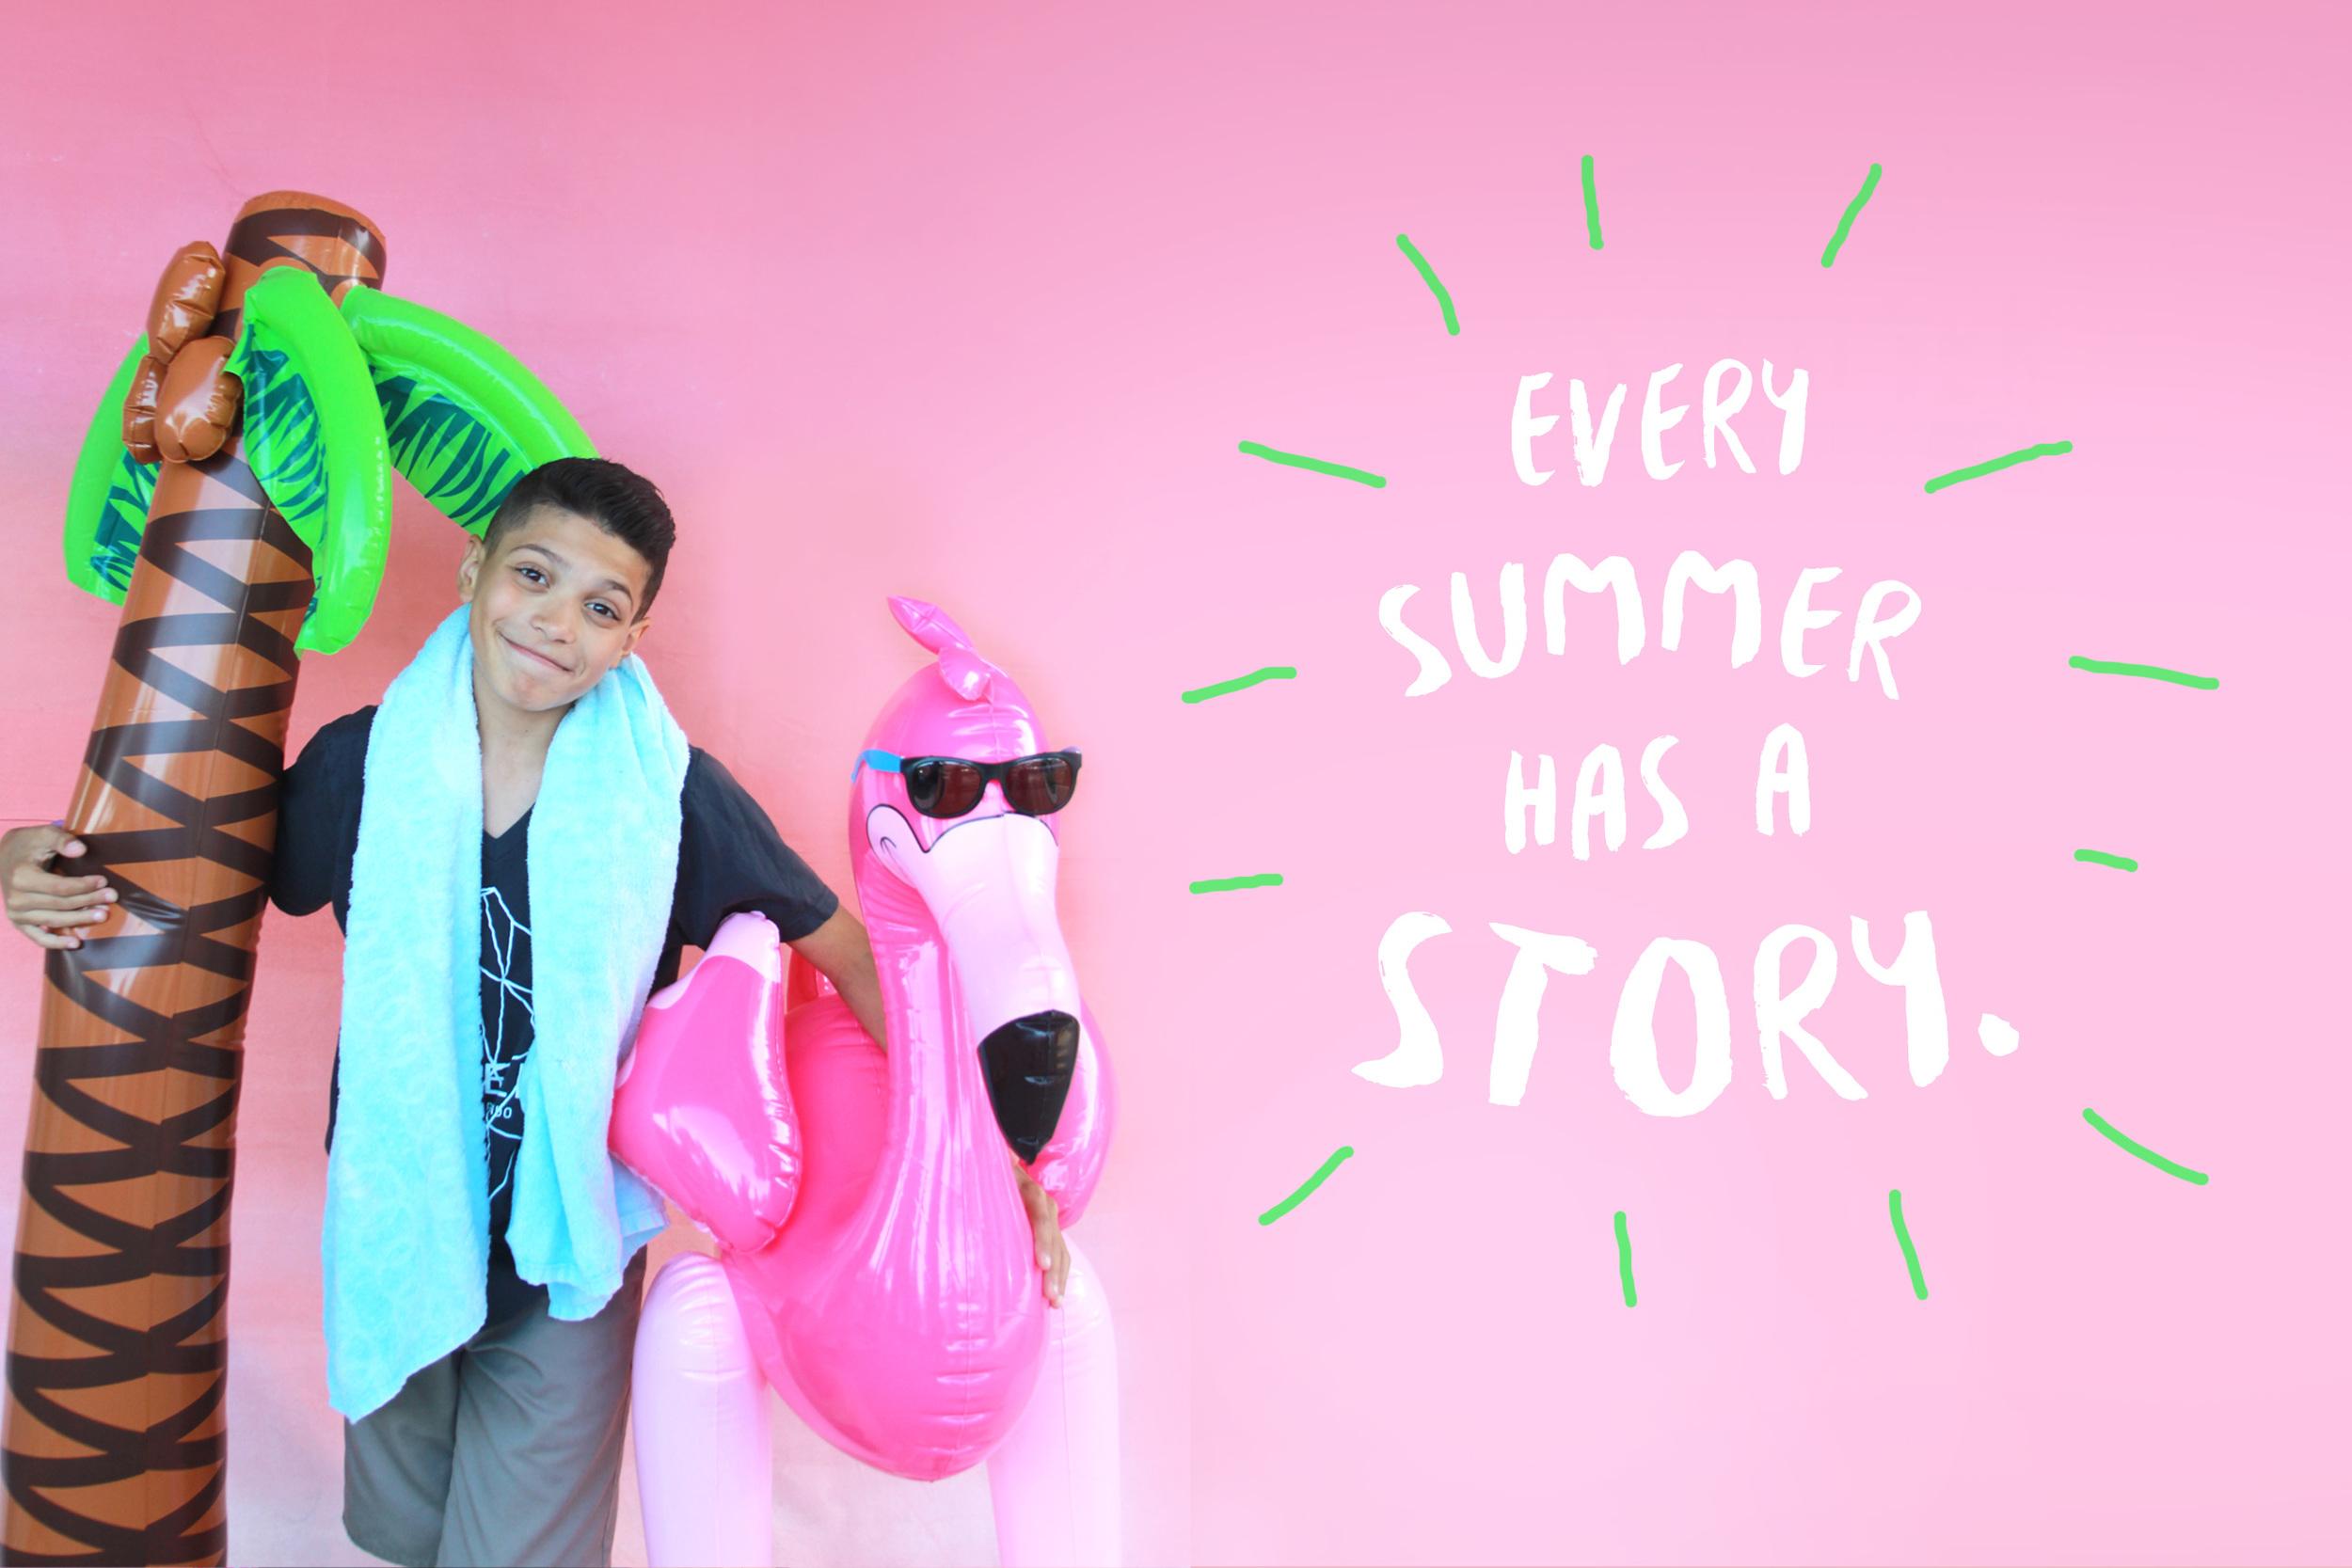 Every-Summer-Has-a-story-(Green).jpg